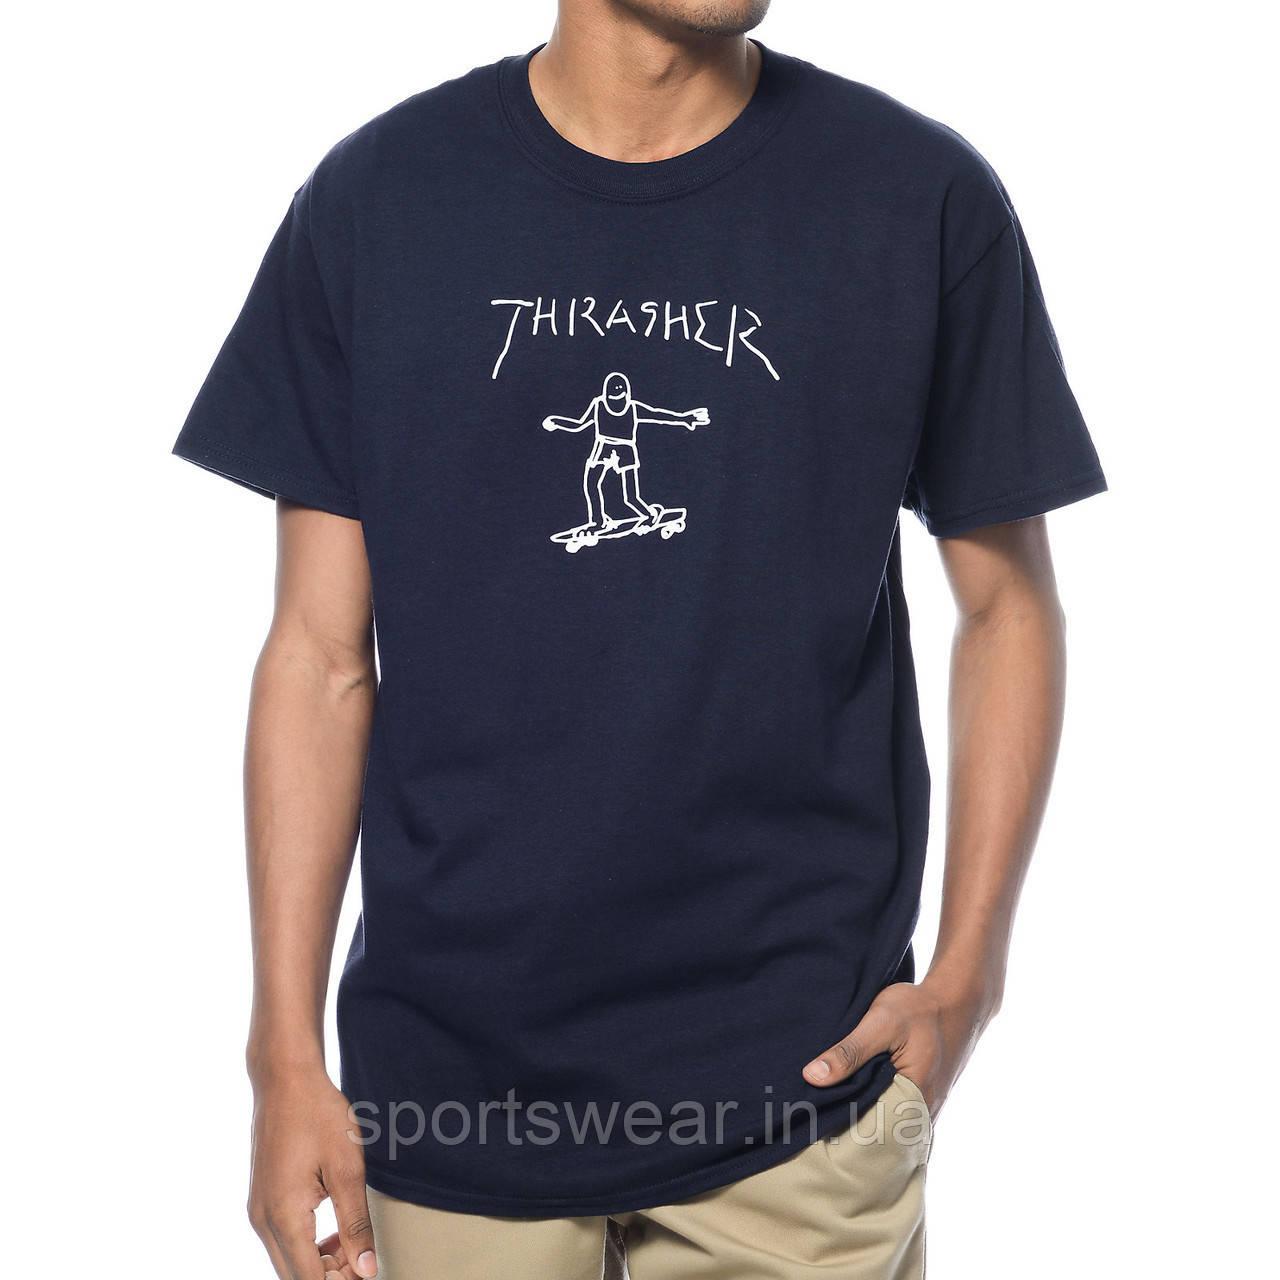 Футболка стильная Thrasher Gonz мужская | Трешер Футболка ( ТЕмно- Синяя )